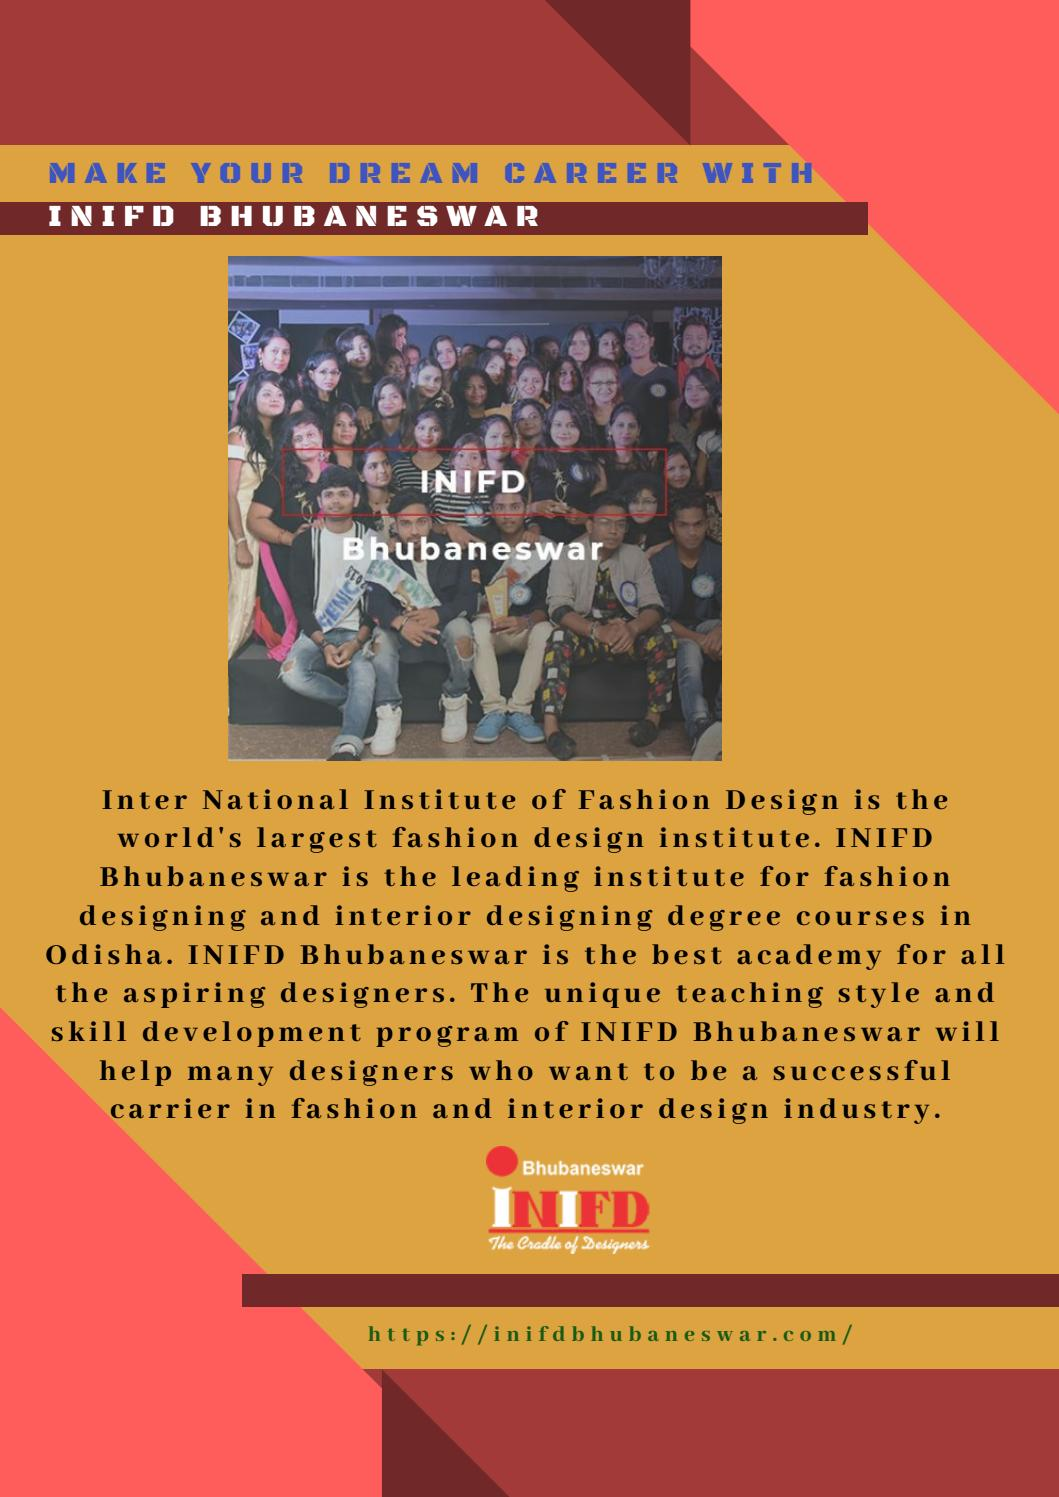 Fashion Designing Institute In Odisha By Inifd Bhubaneswar Issuu